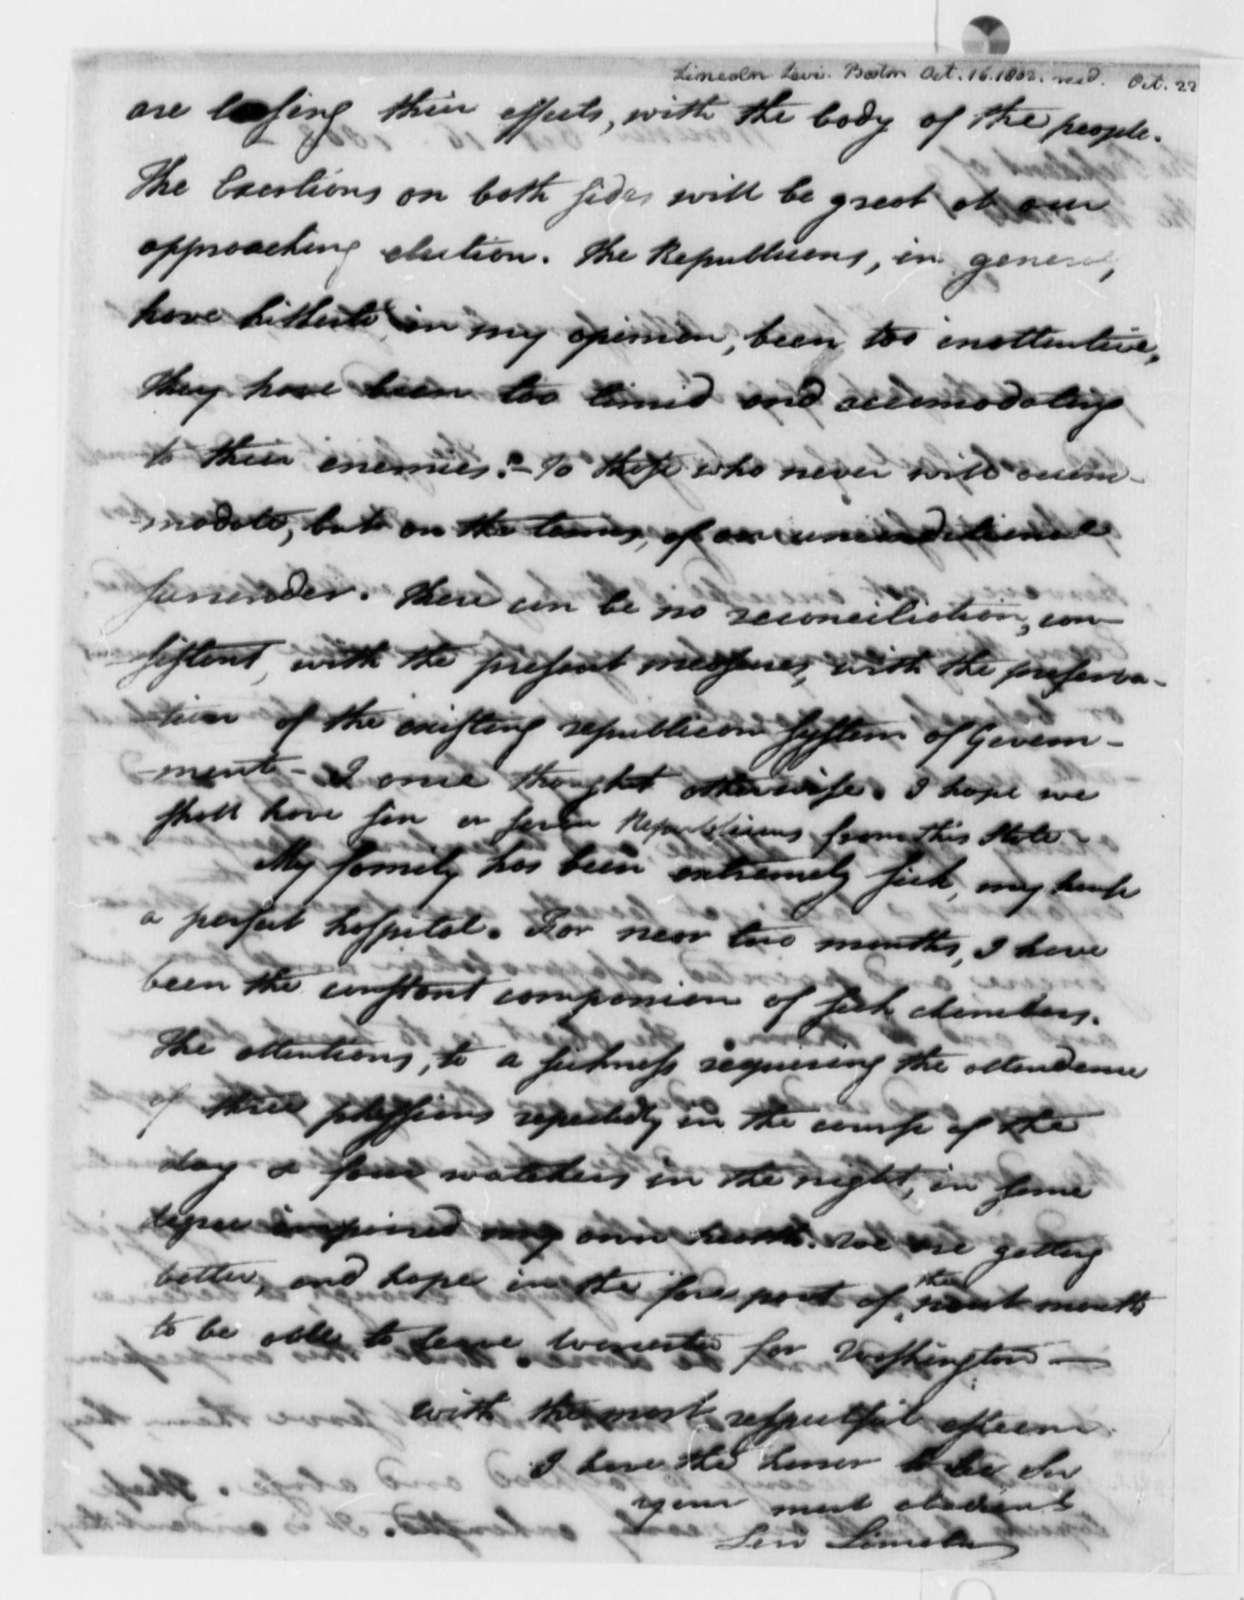 Levi Lincoln to Thomas Jefferson, October 16, 1802